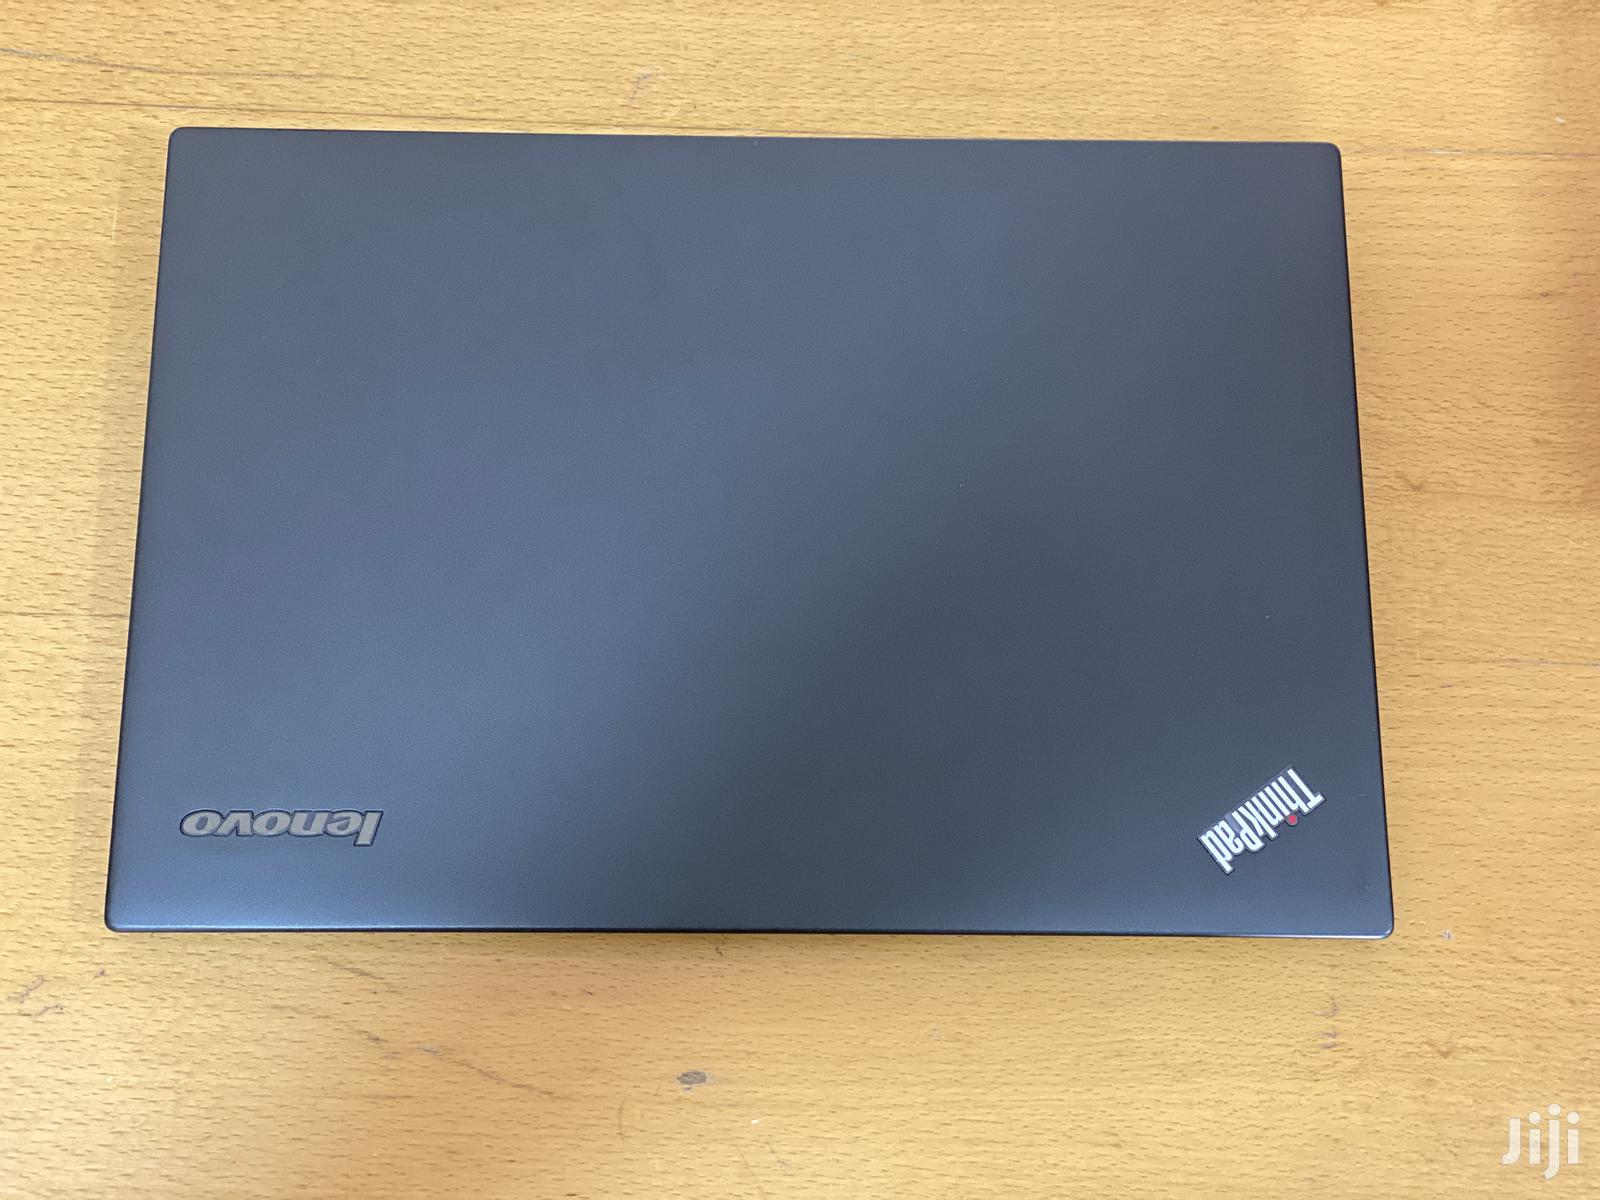 Archive: Laptop Lenovo ThinkPad X1 Carbon 8GB Intel Core i5 SSD 256GB